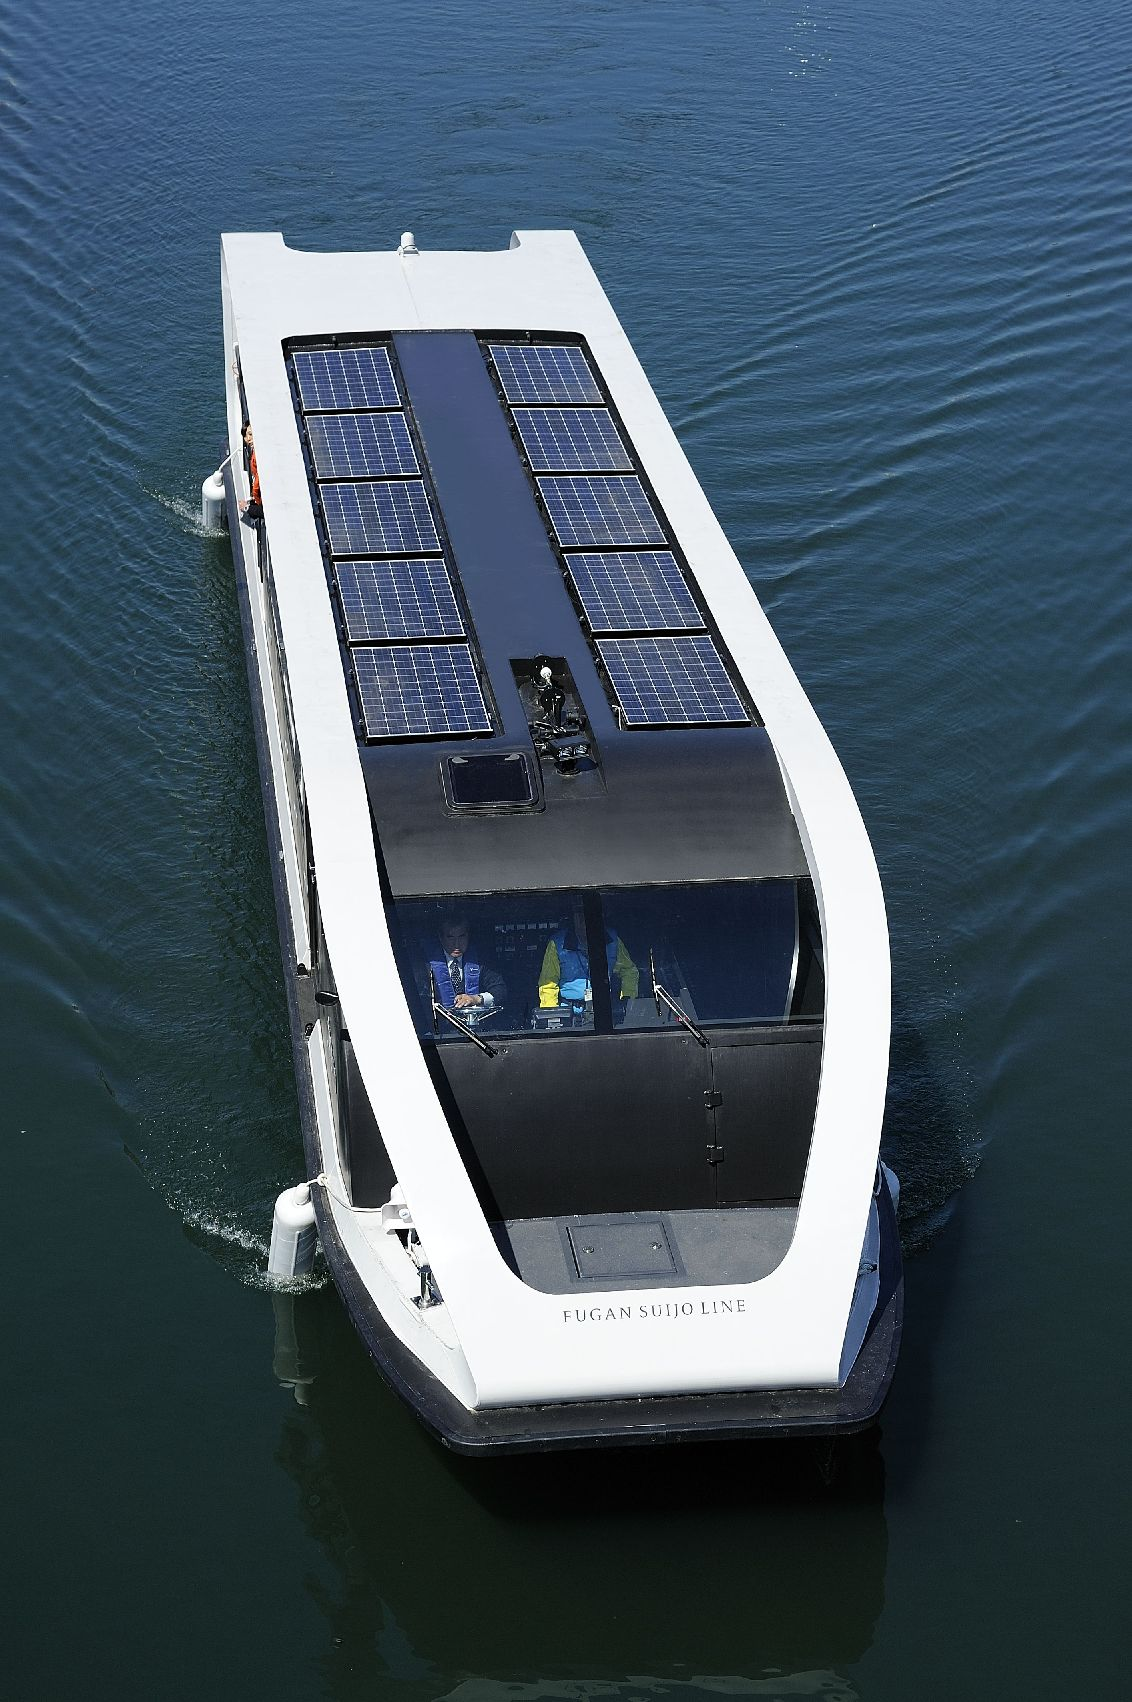 CE-97 fugan 電気推進船